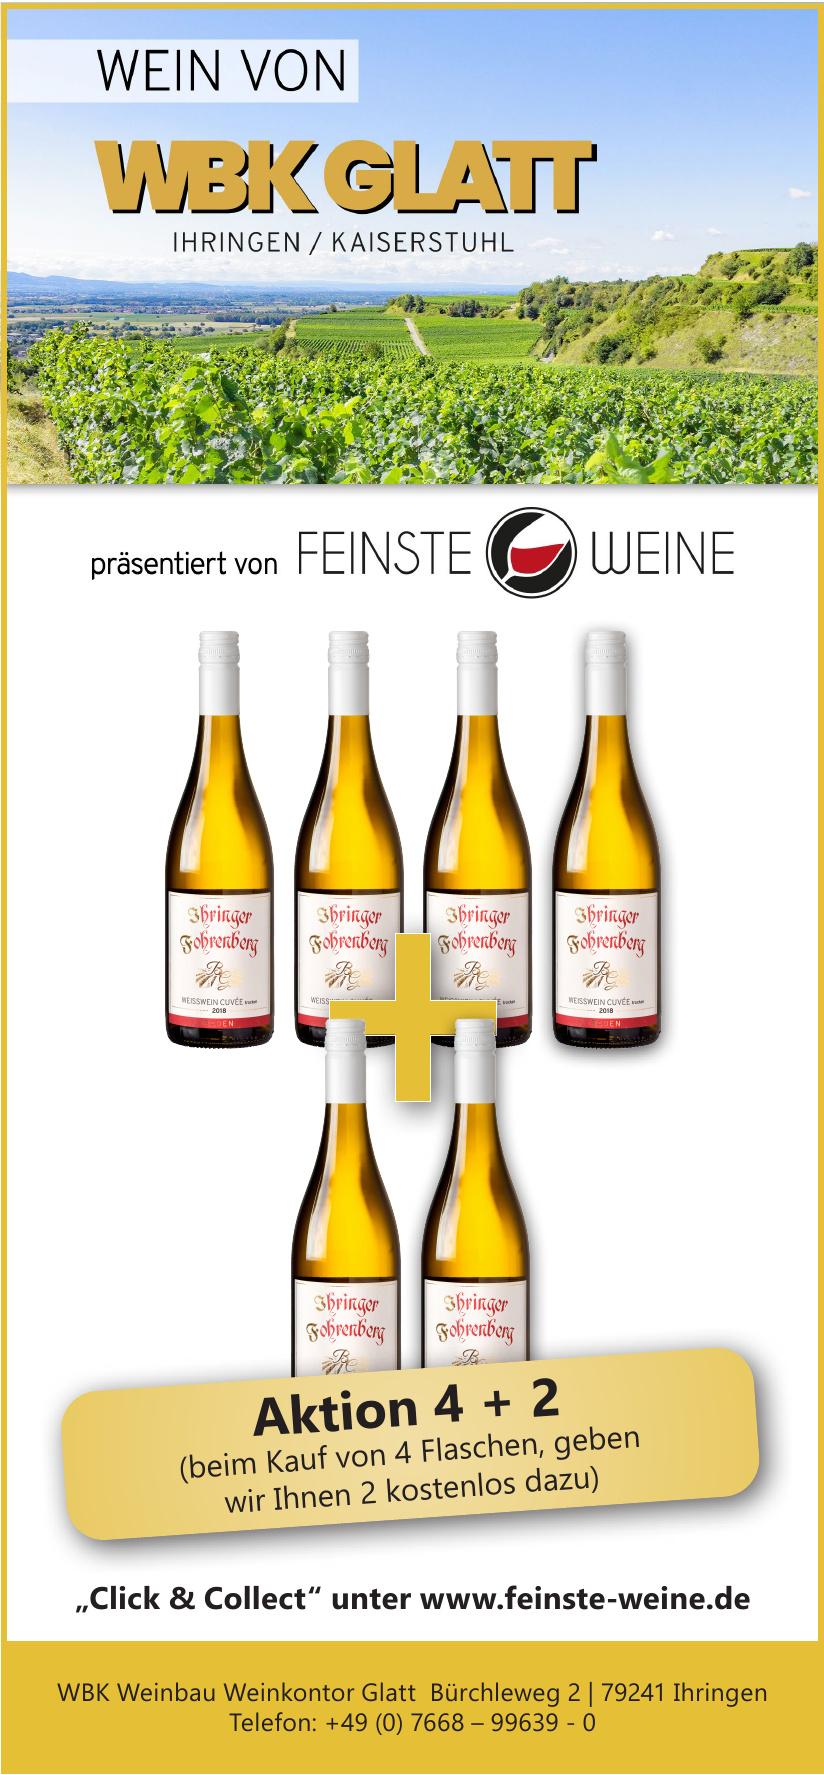 WBK Weinbau Weinkontor Glatt